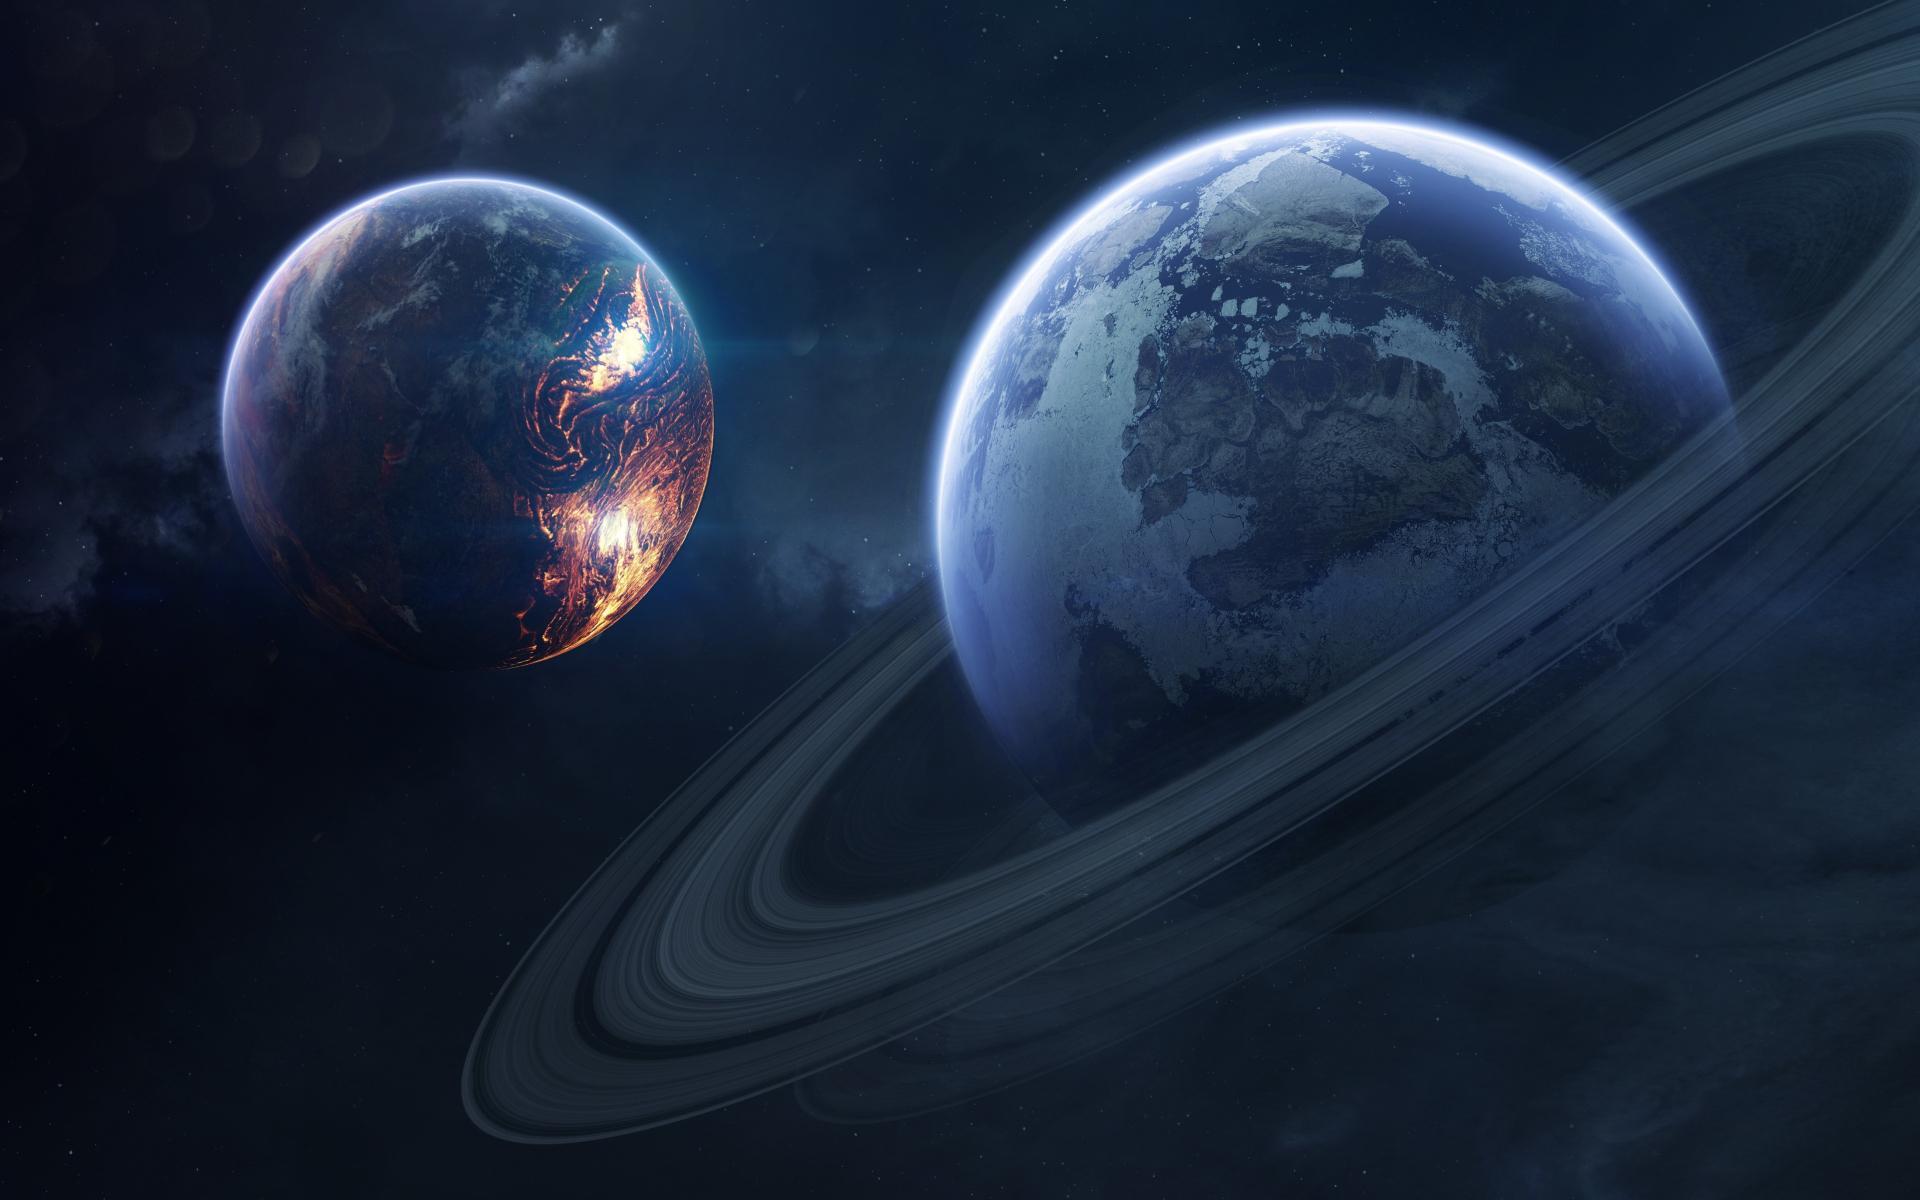 Saturn, space, planet of rings, 1920x1200 wallpaper